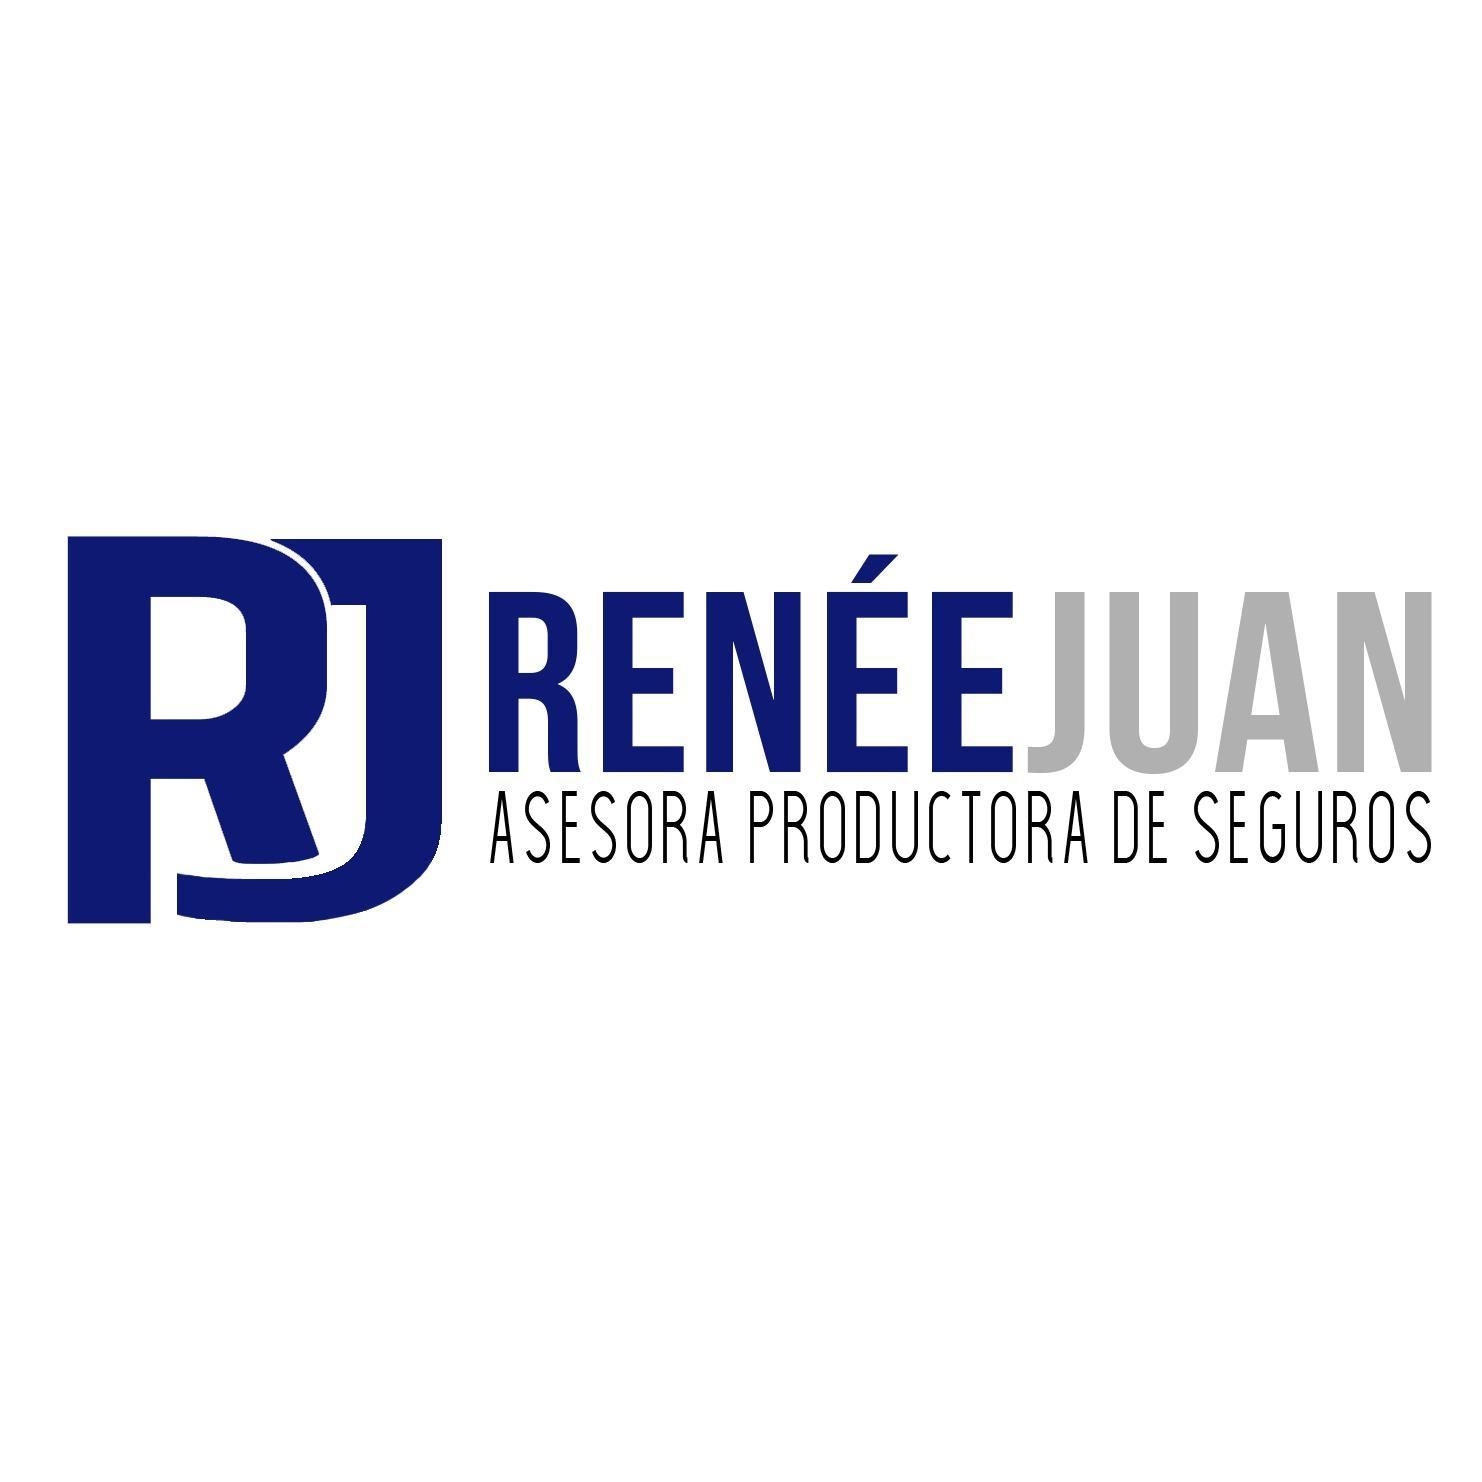 RENEE JUAN-ASESORA EN SEGUROS